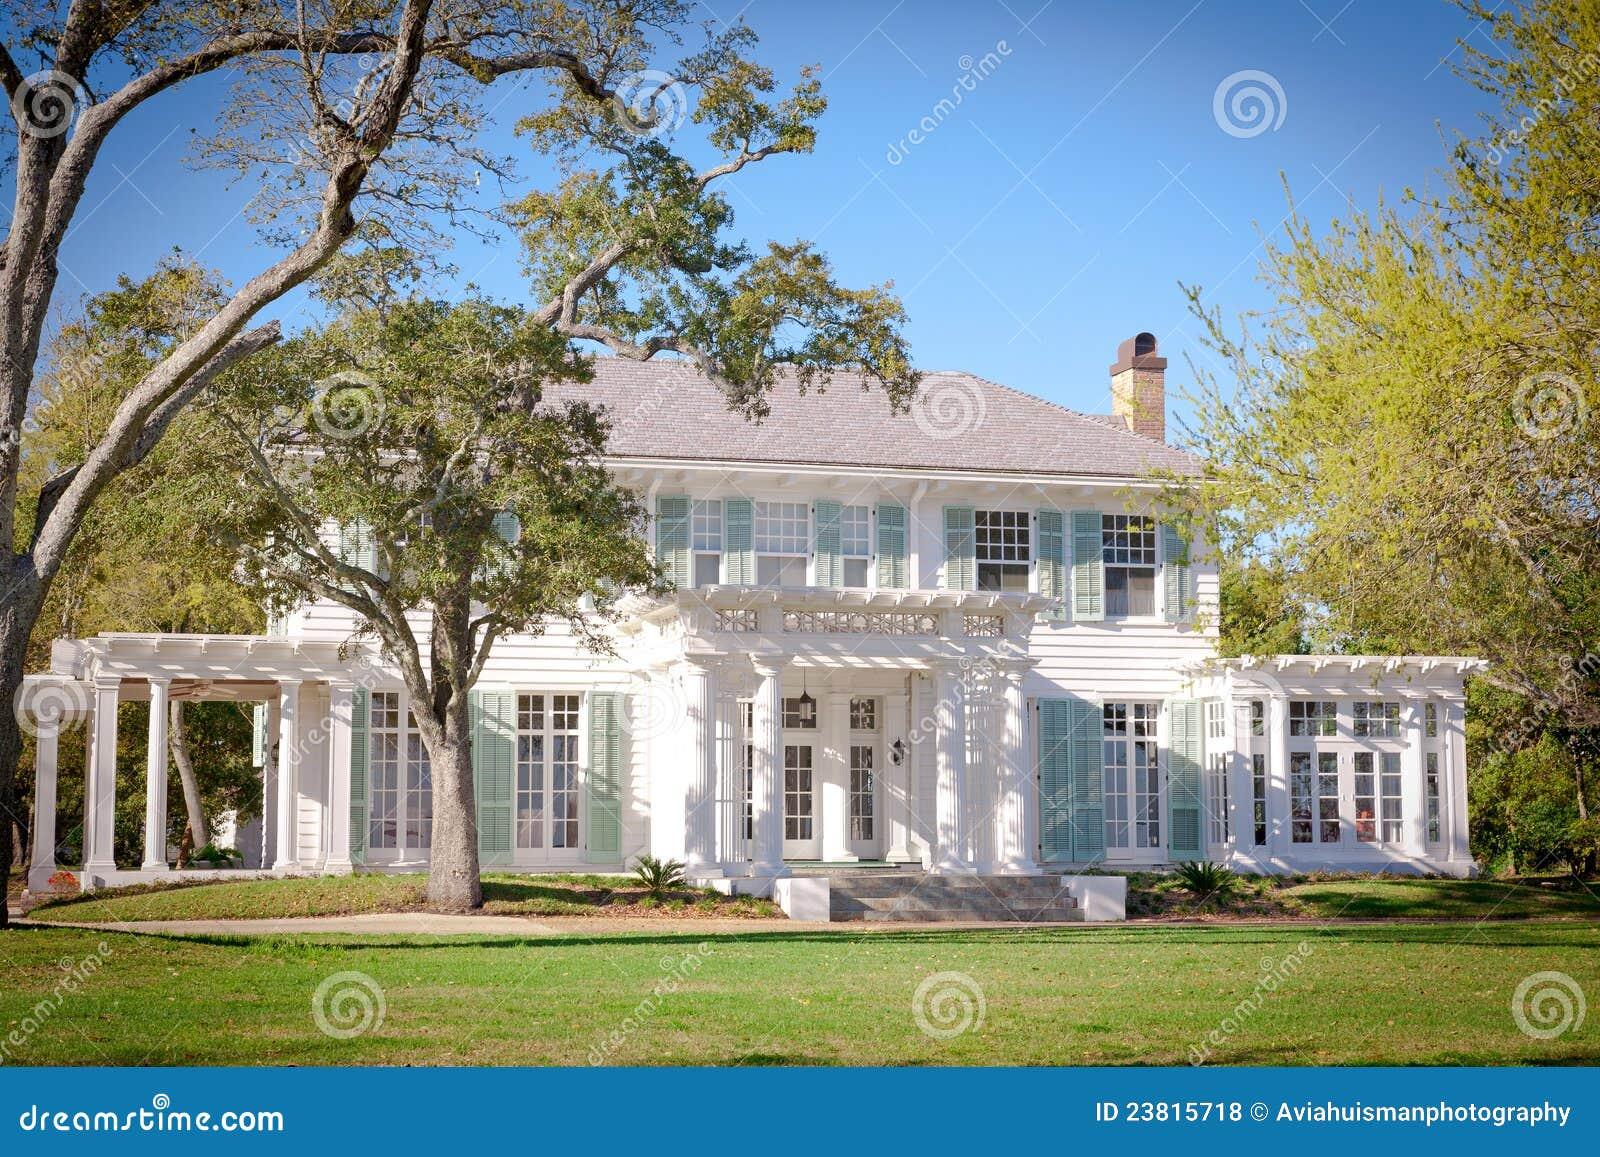 southern house plans porches anelti com beautiful southern house plans porches 3 american southern style mansion